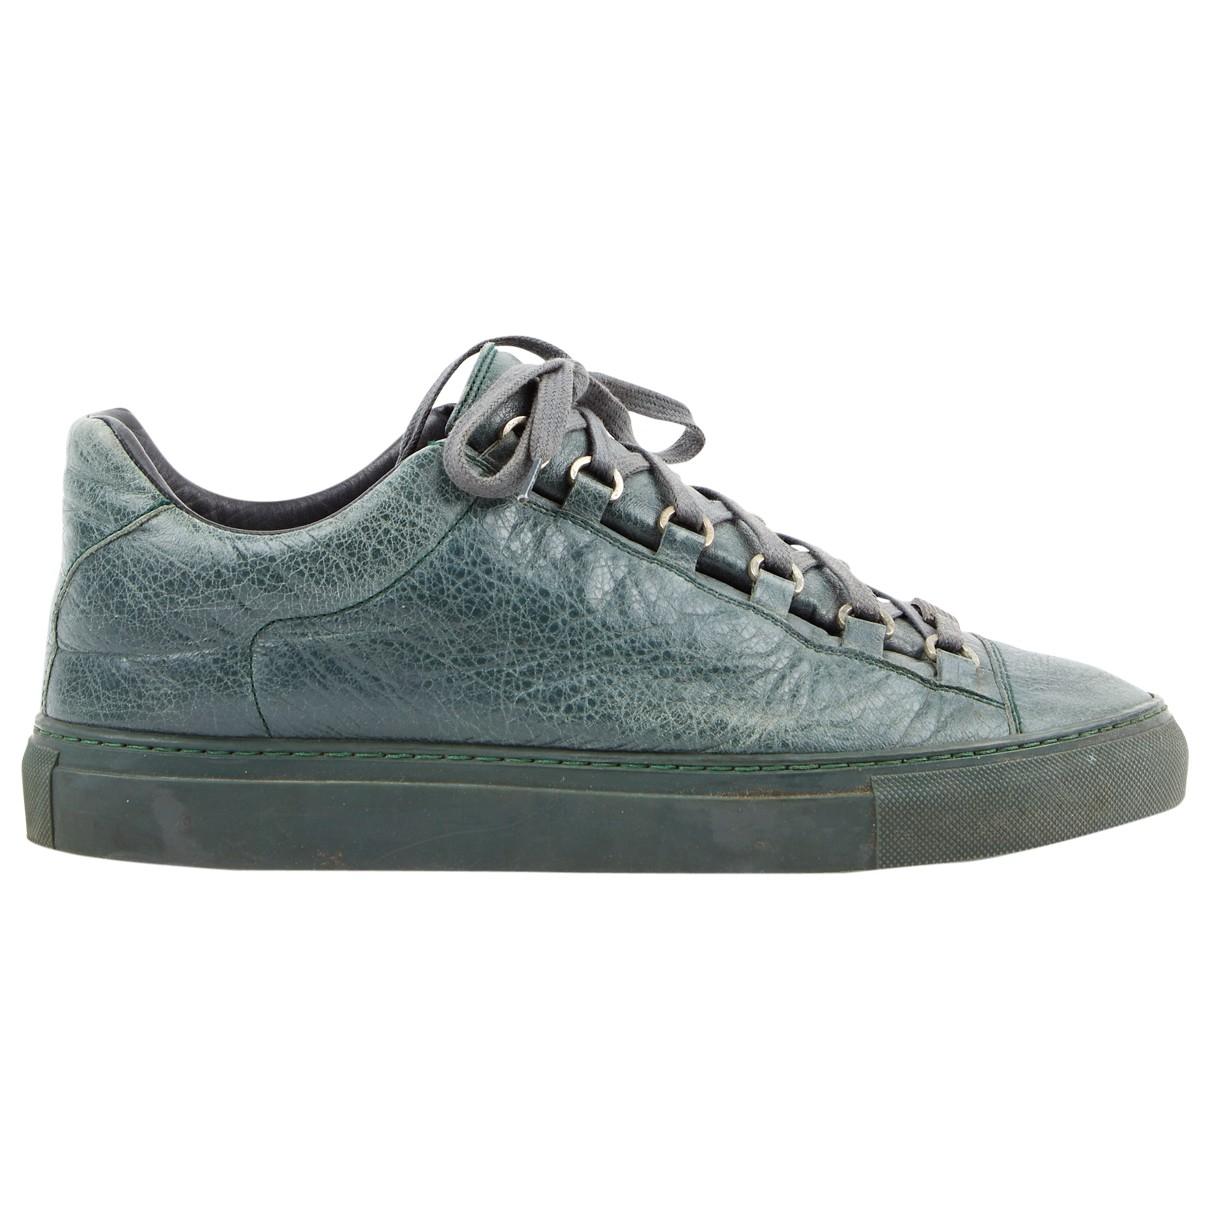 Balenciaga Arena Sneakers in  Gruen Leder